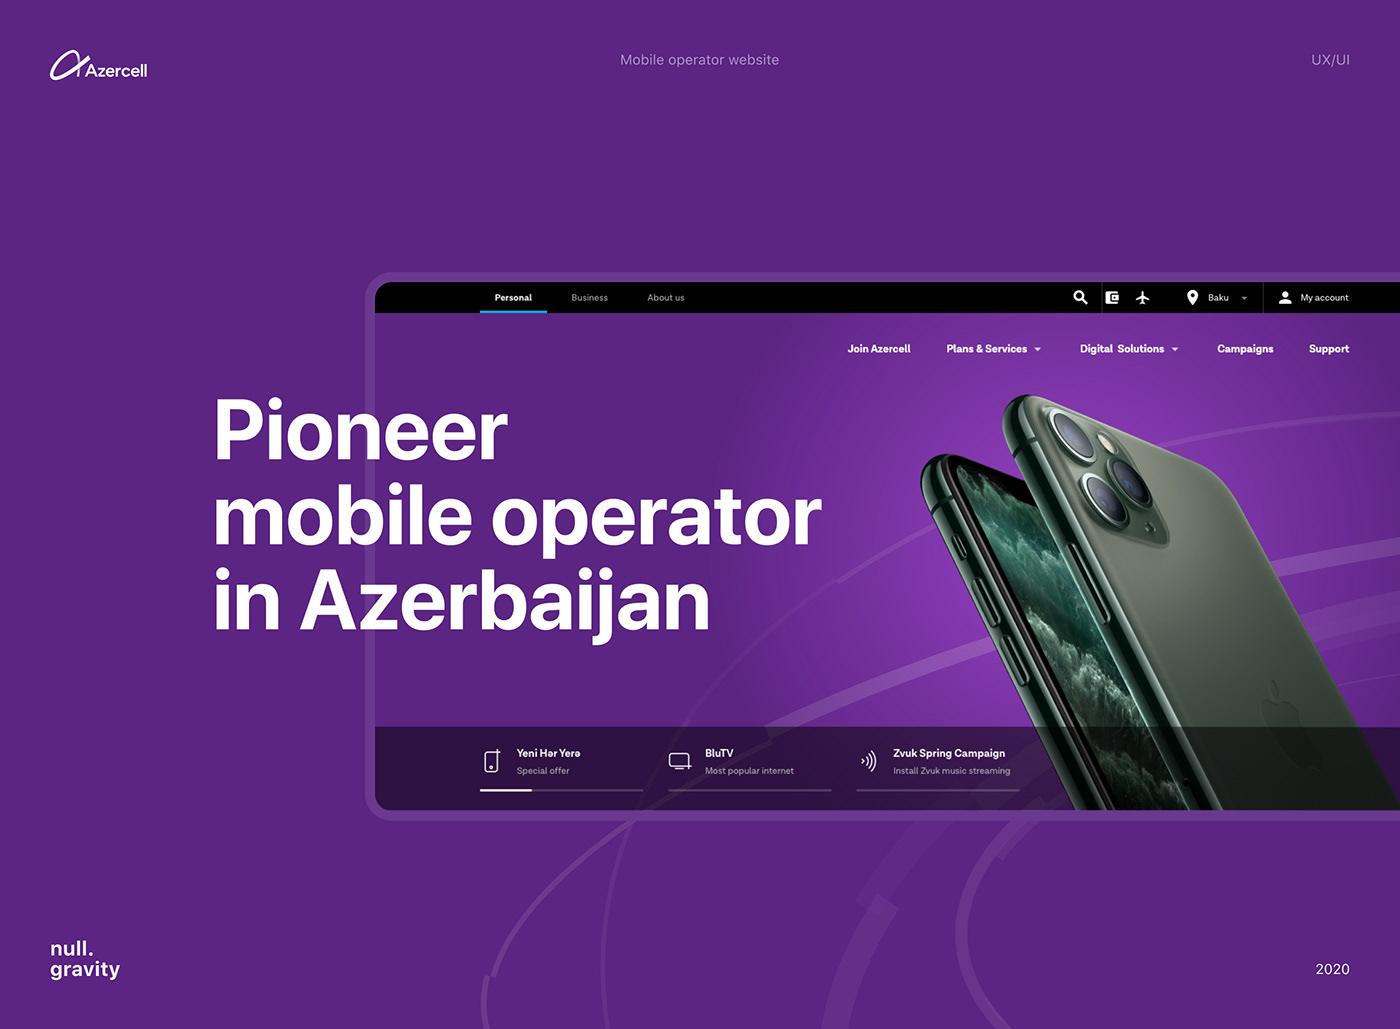 4g 5g carrier operator self-service Telecom UI/UX Web